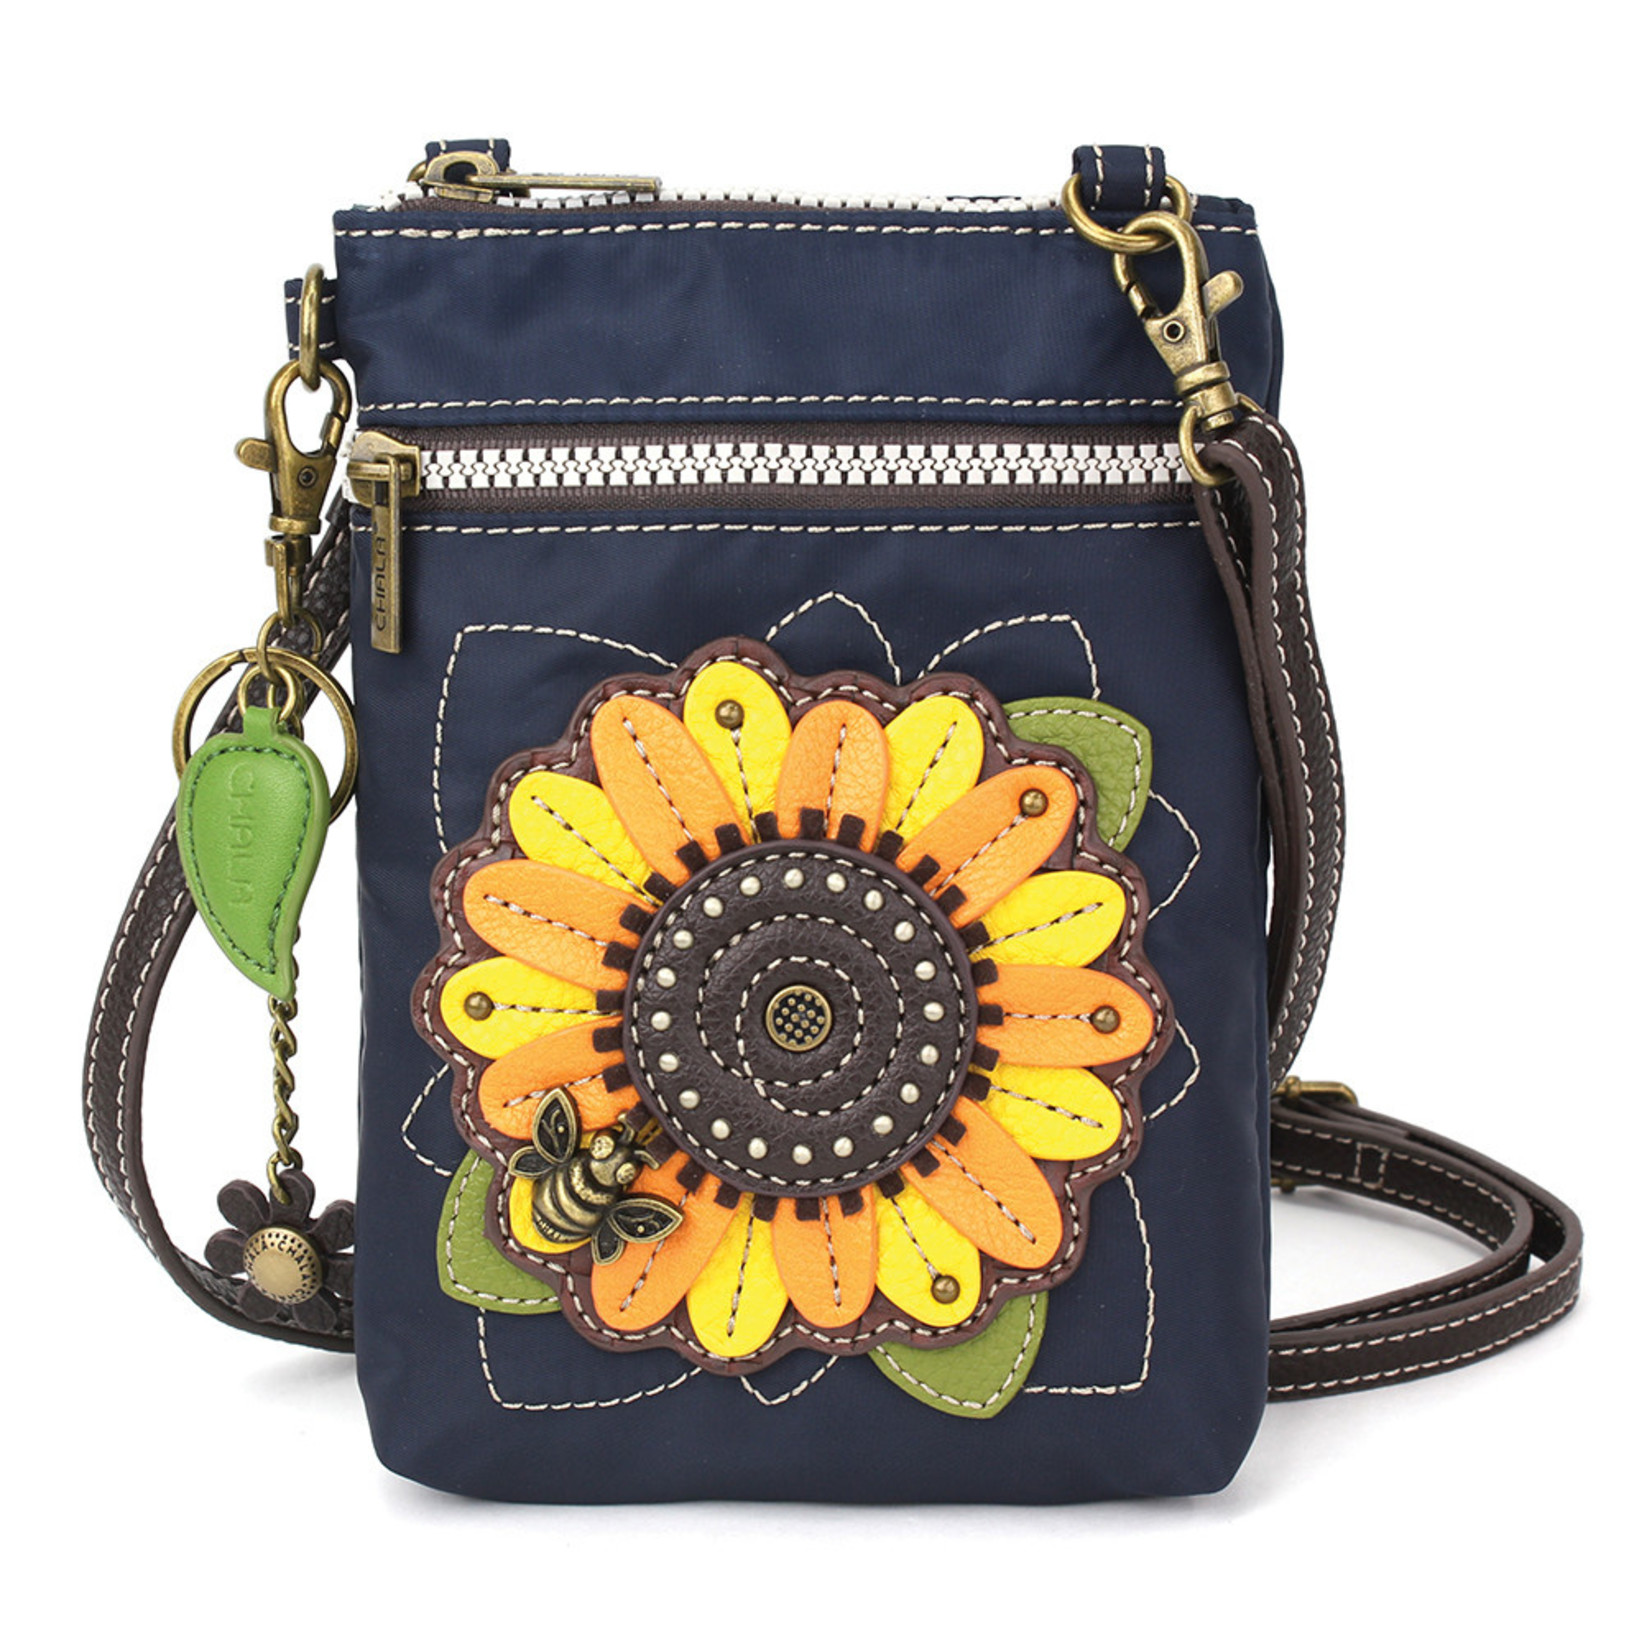 Chala Venture Cell Phone Crossbody - Sunflower - Navy